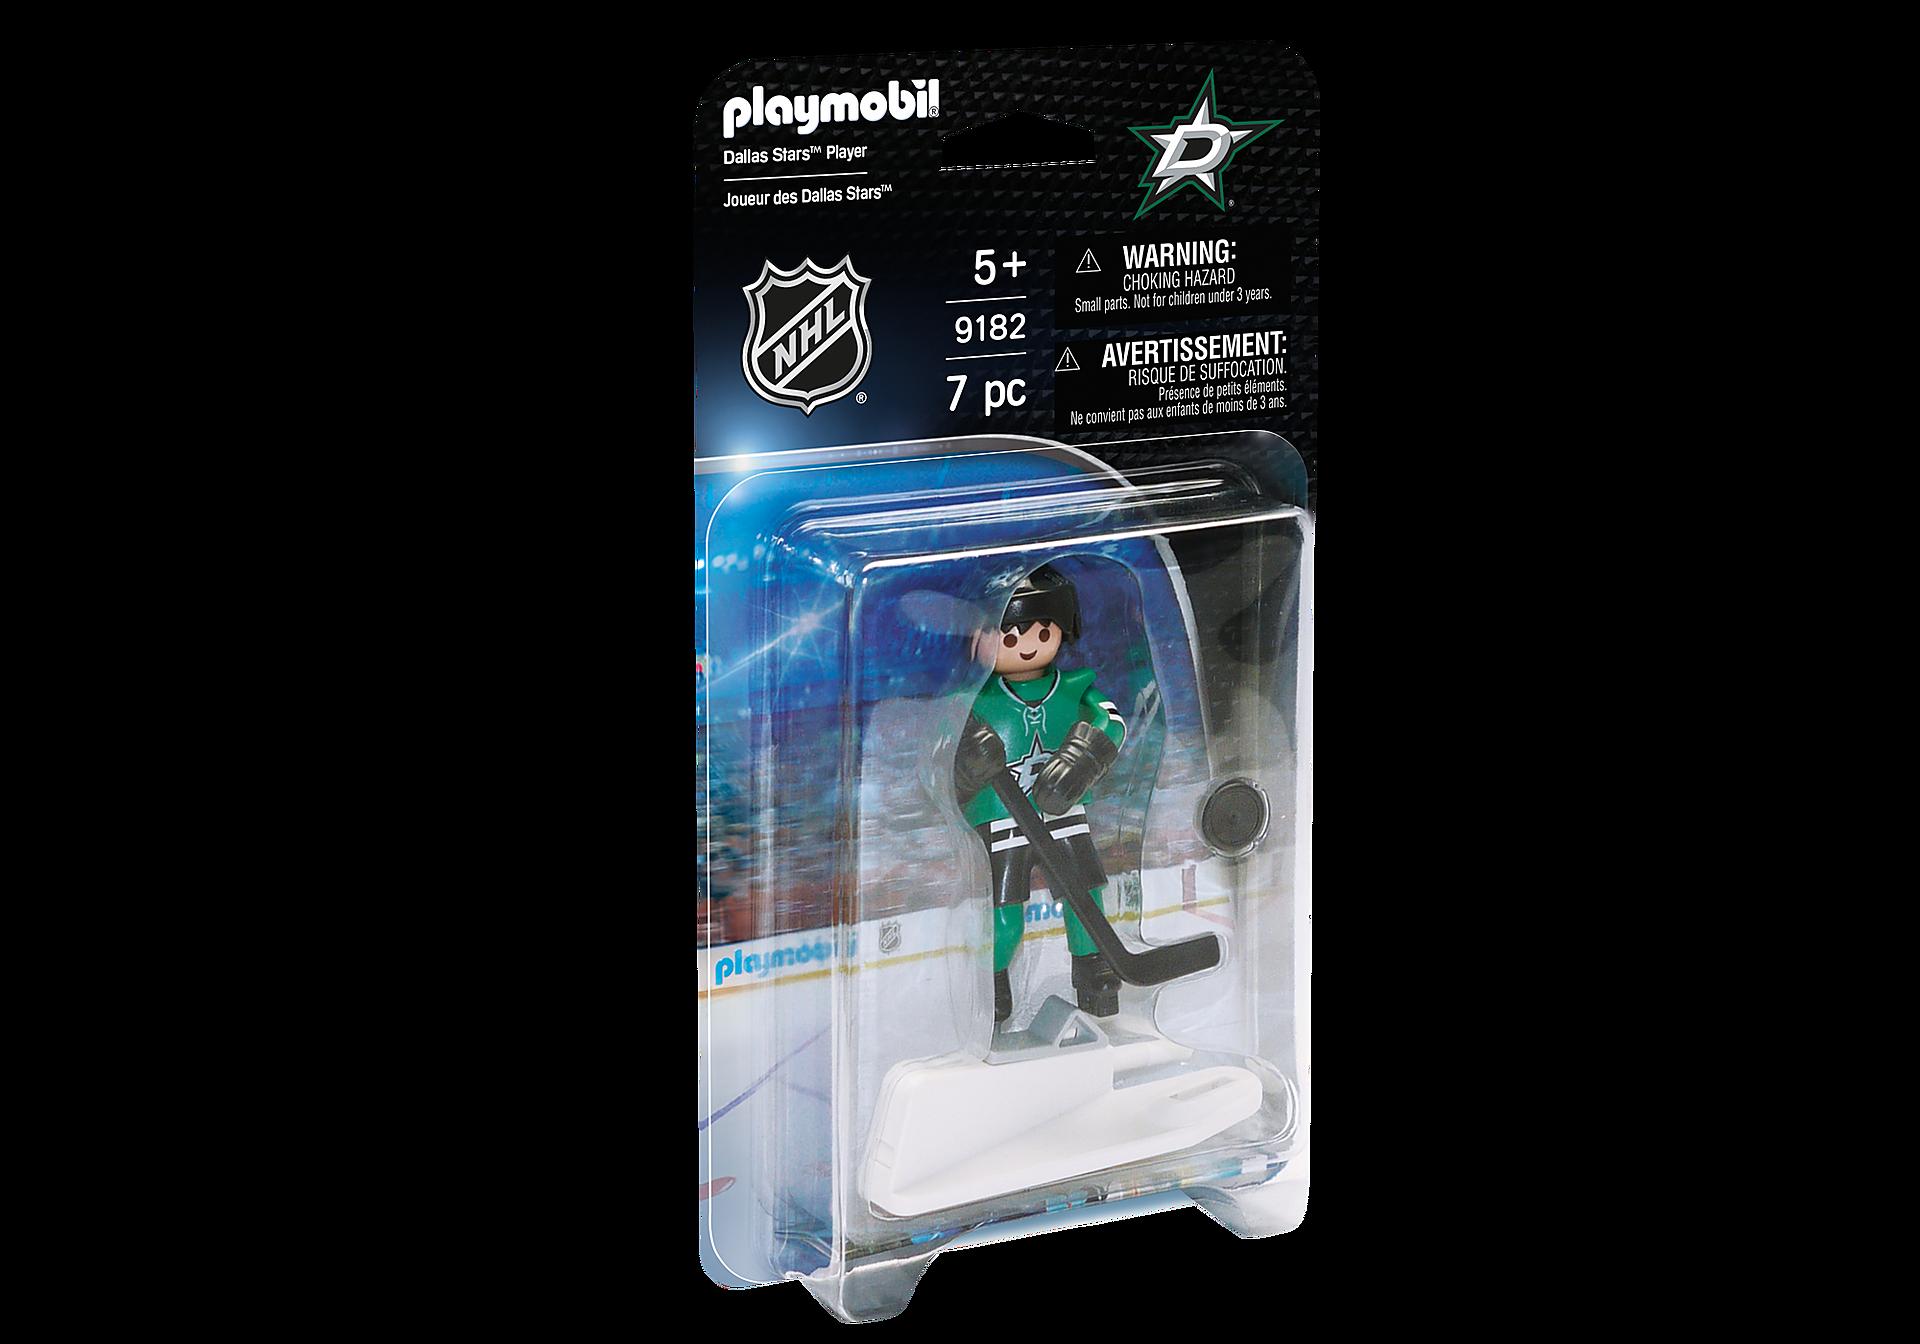 http://media.playmobil.com/i/playmobil/9182_product_box_front/NHL® Dallas Stars® Player